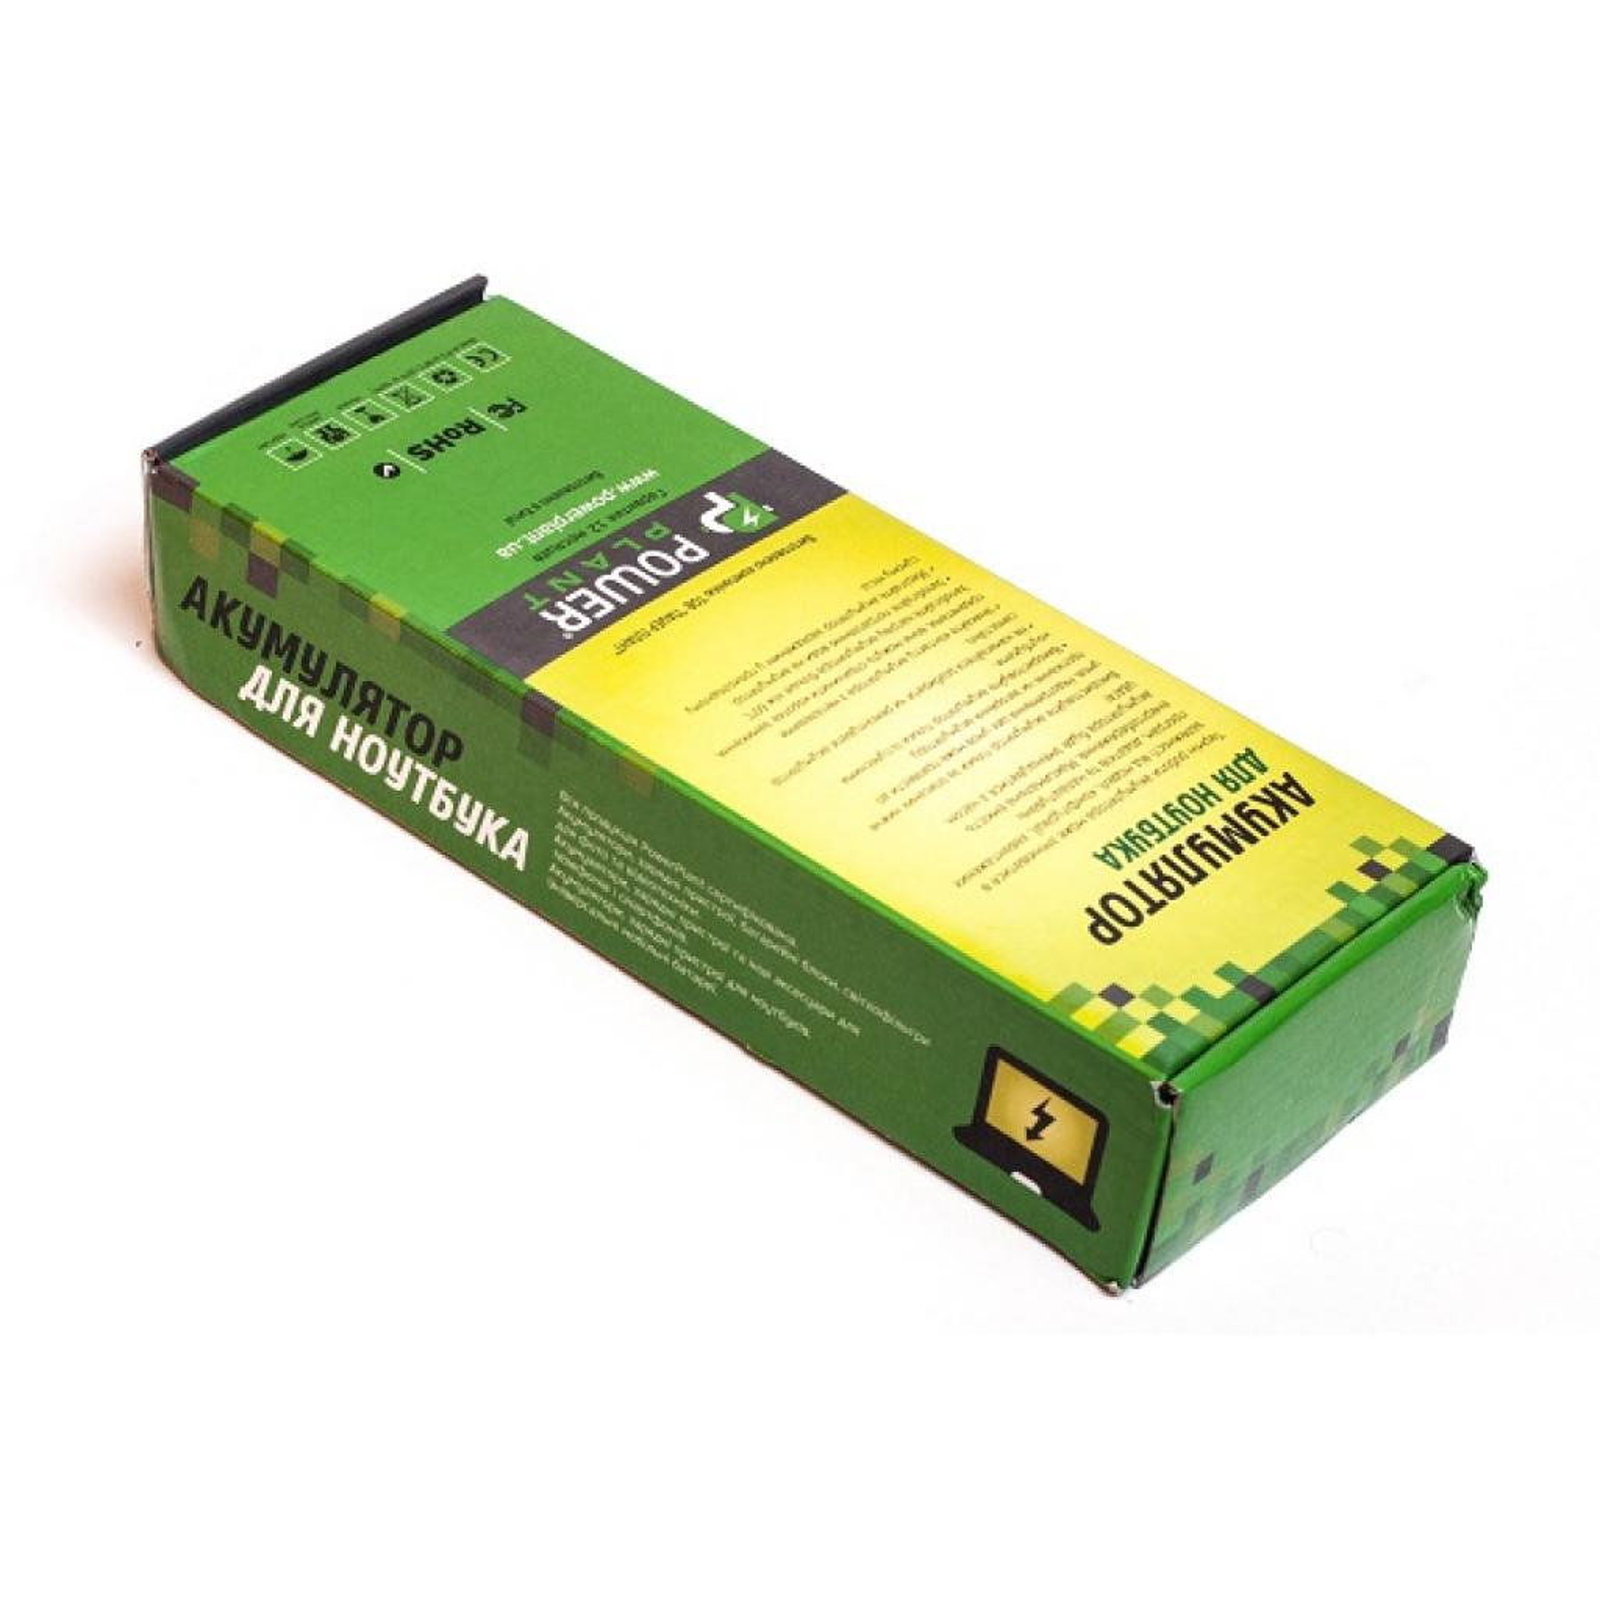 Аккумулятор для ноутбука HP DV7 (HSTNN-IB75) 14.4V 4400mAh PowerPlant (NB00000192) изображение 2